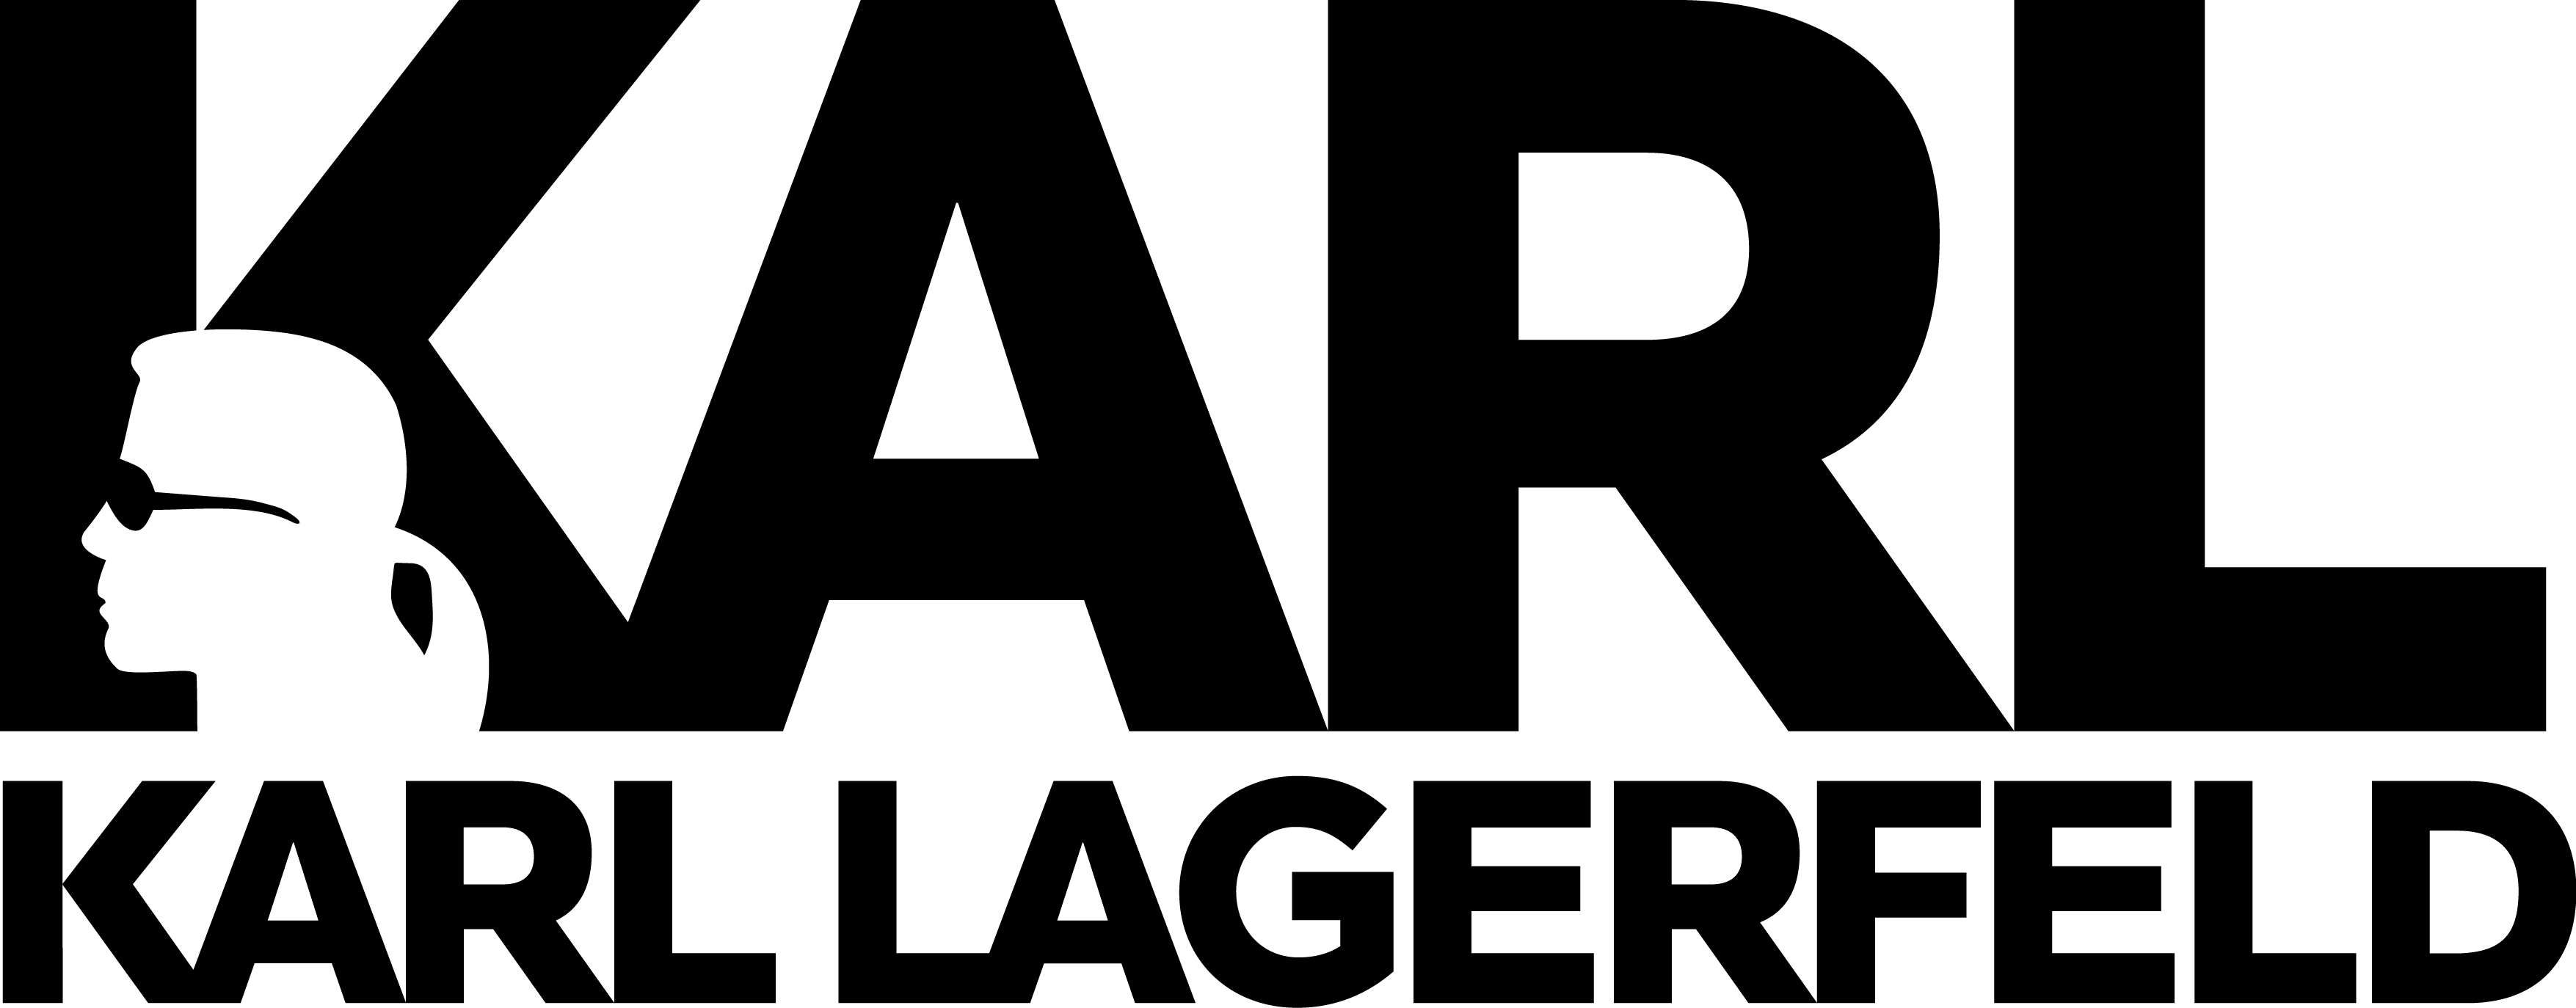 Karl Lagerfeld Logo png